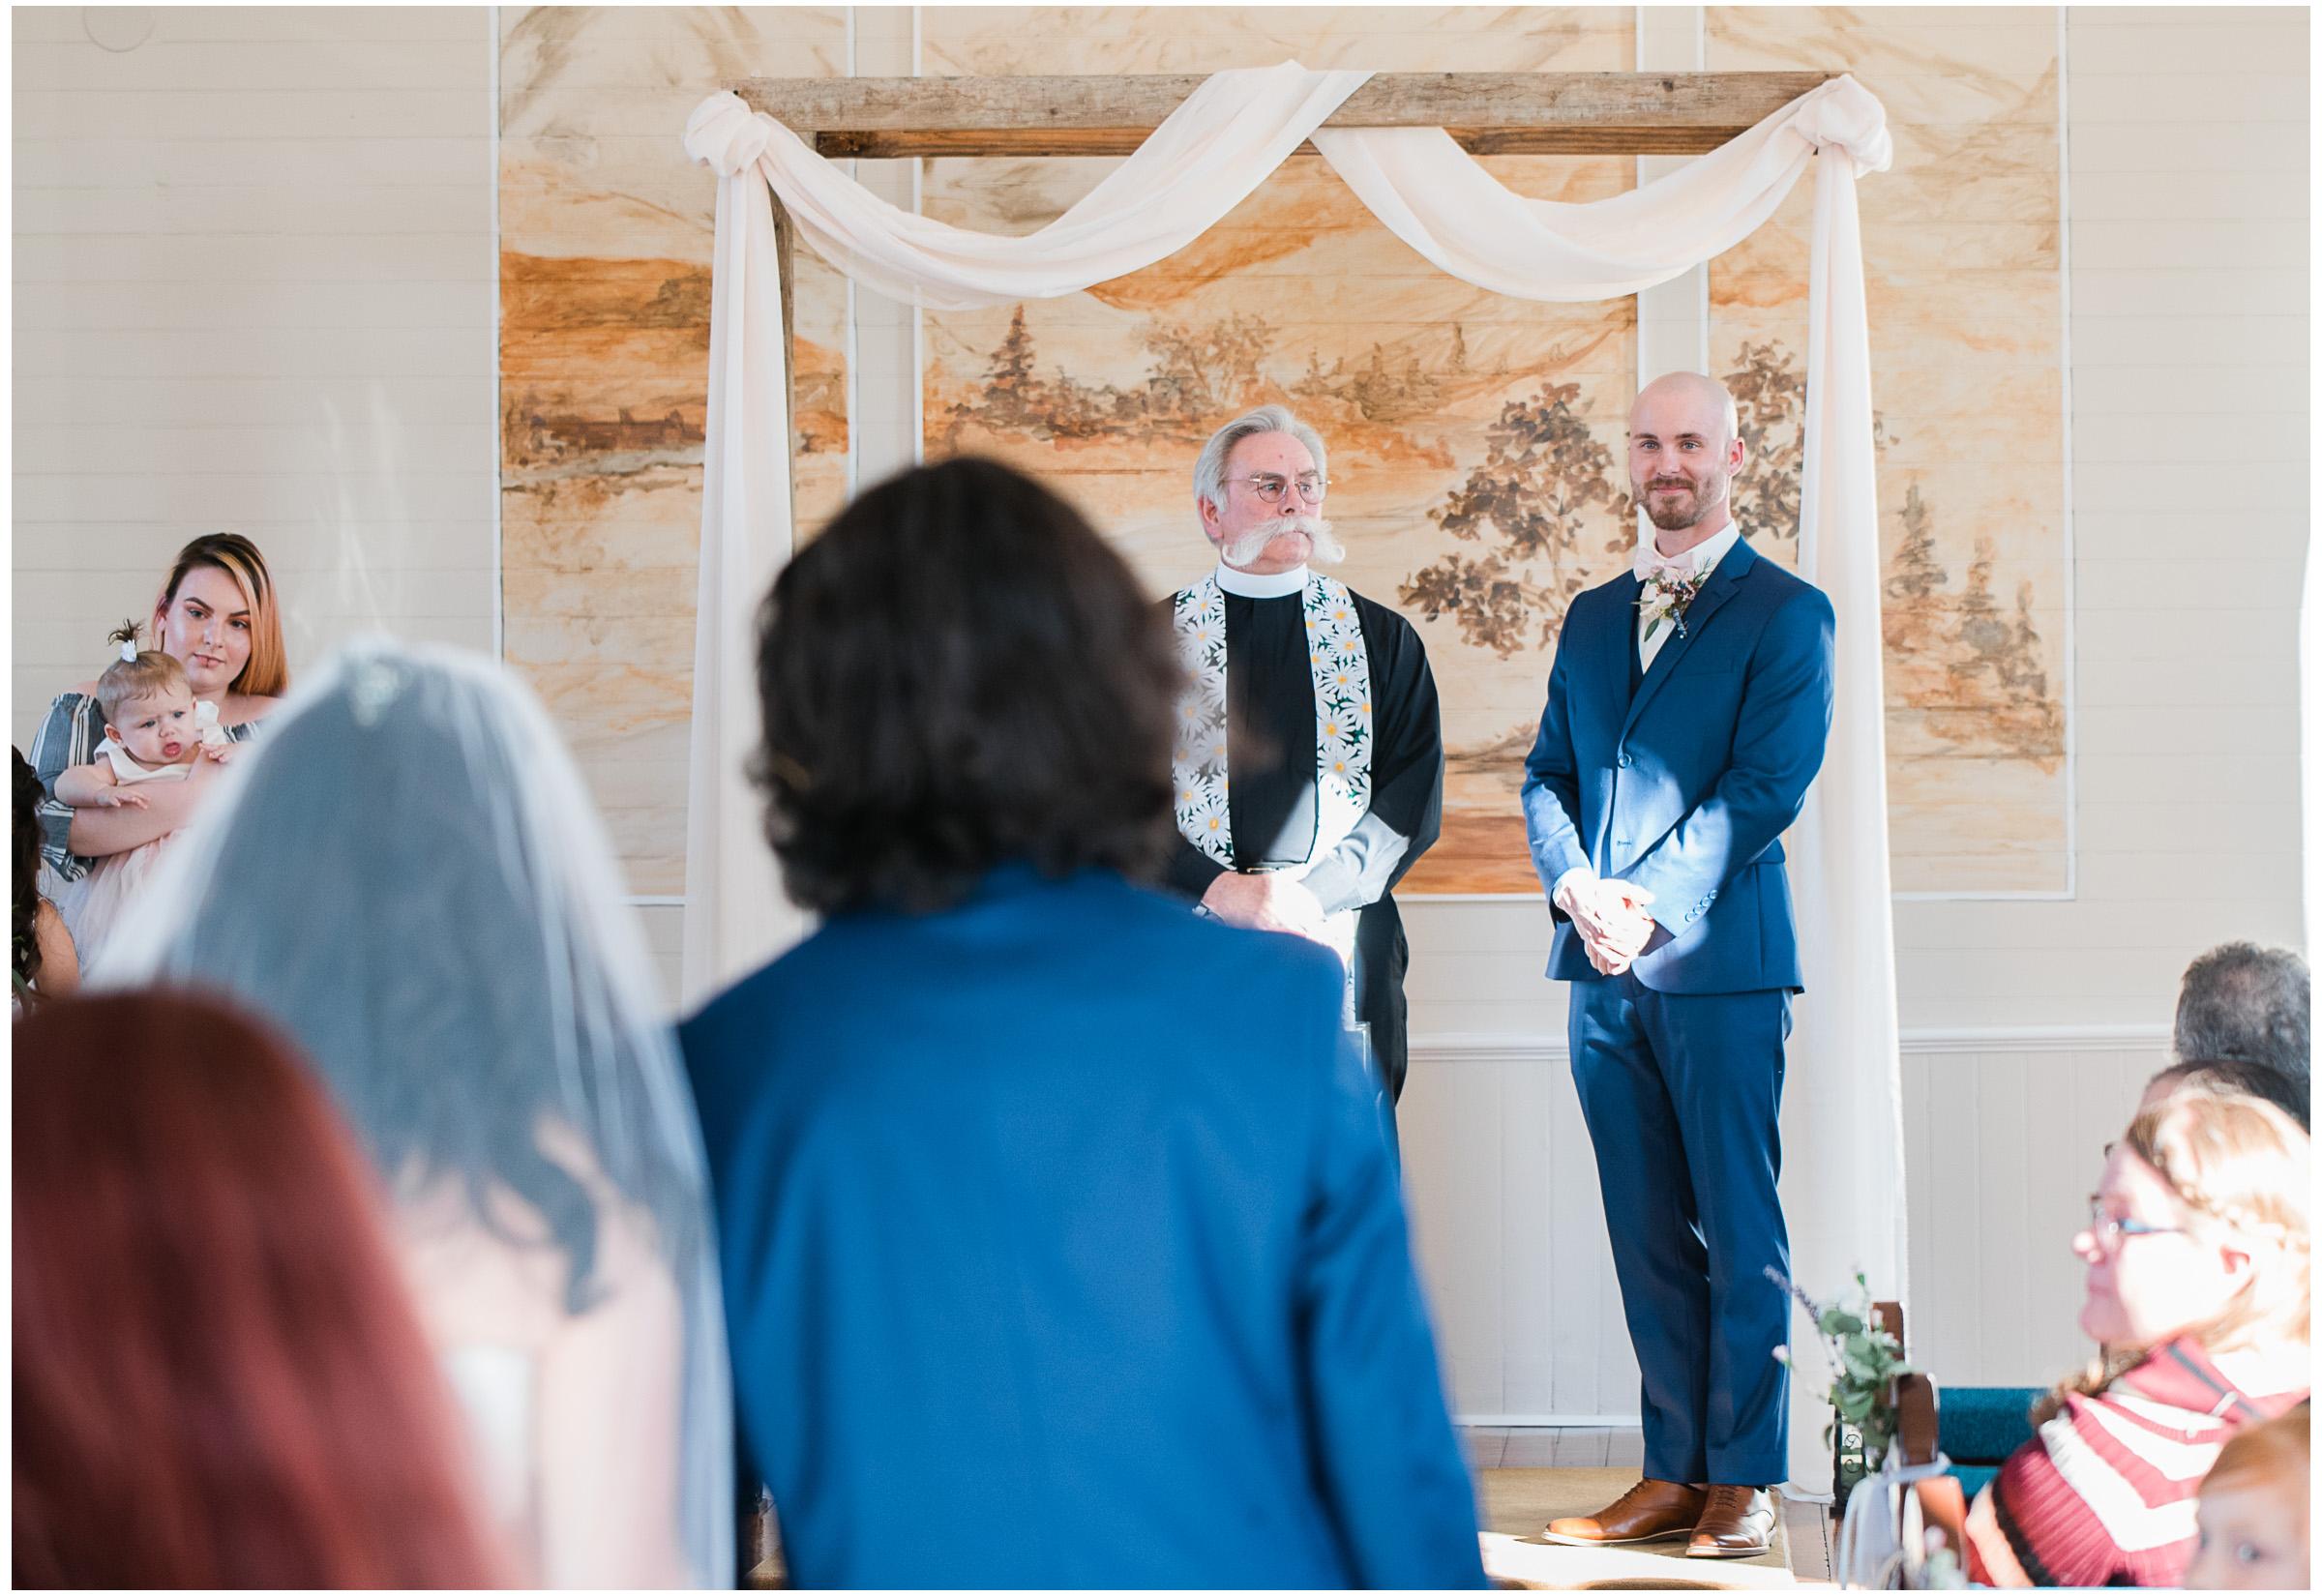 Sacramento Wedding - Sacramento Photographer - Justin Wilcox Photography - 11.jpg